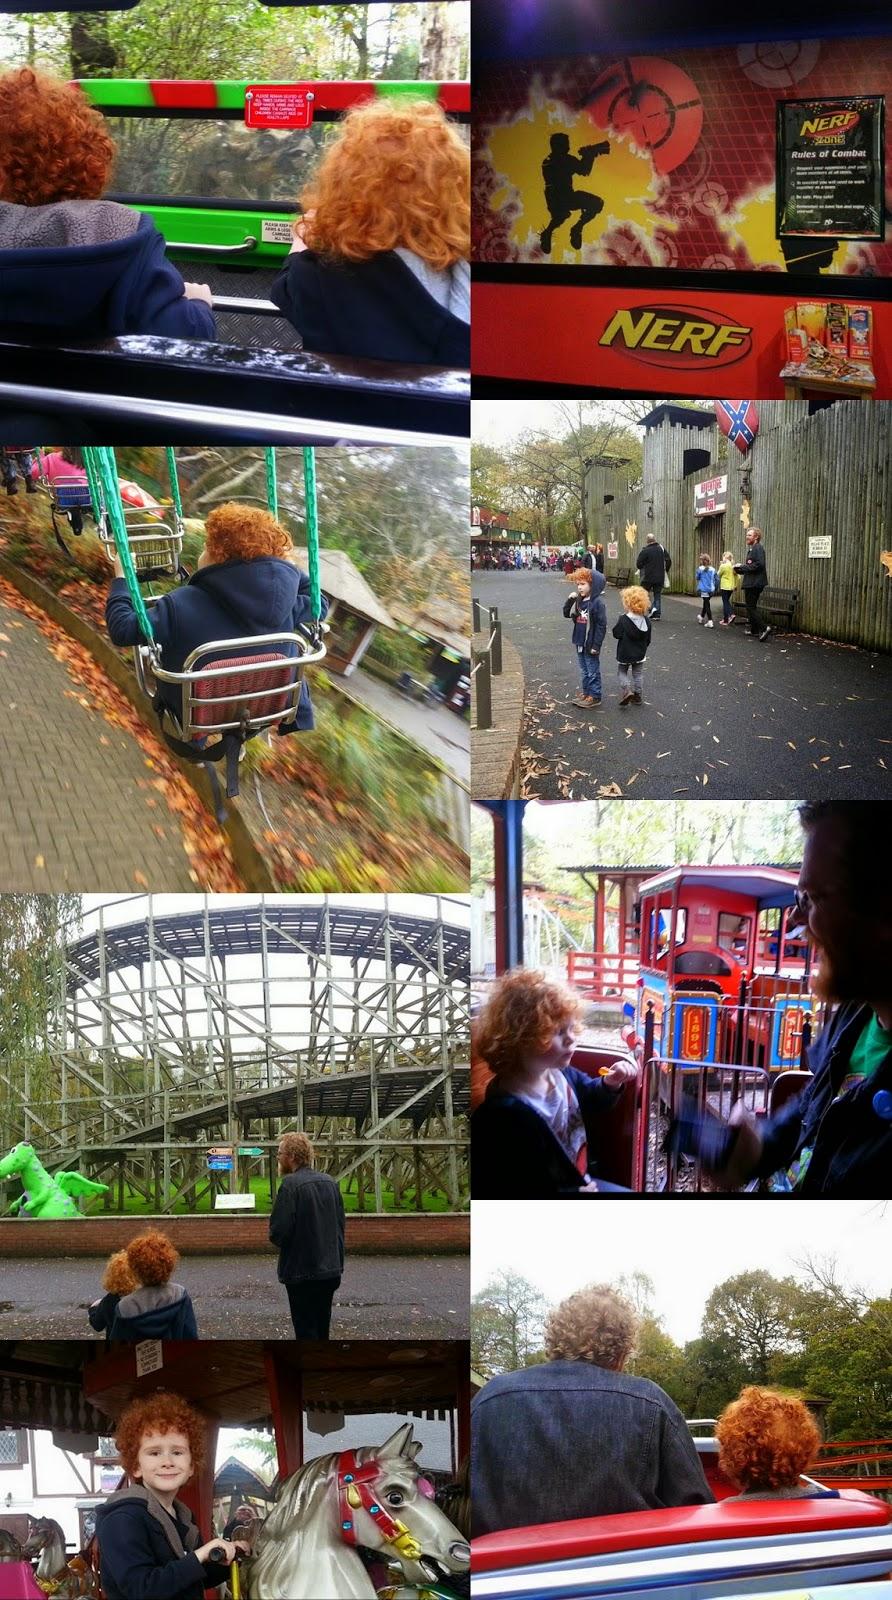 Gulliver's World Children's theme park rides swings nerf zone